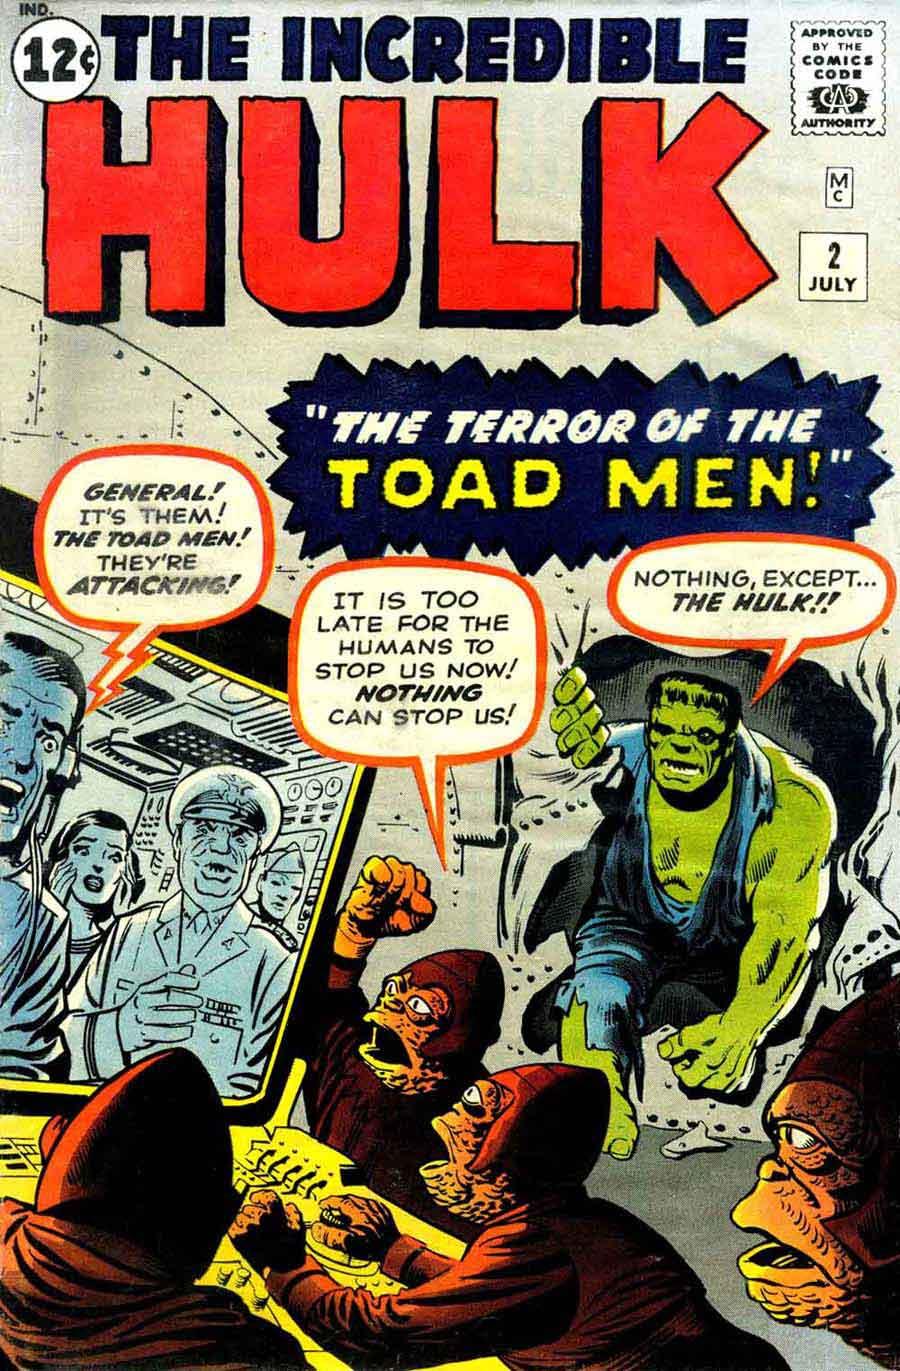 Incredible Hulk v1 #2 marvel comic book cover art by Jack Kirby & Steve Ditko